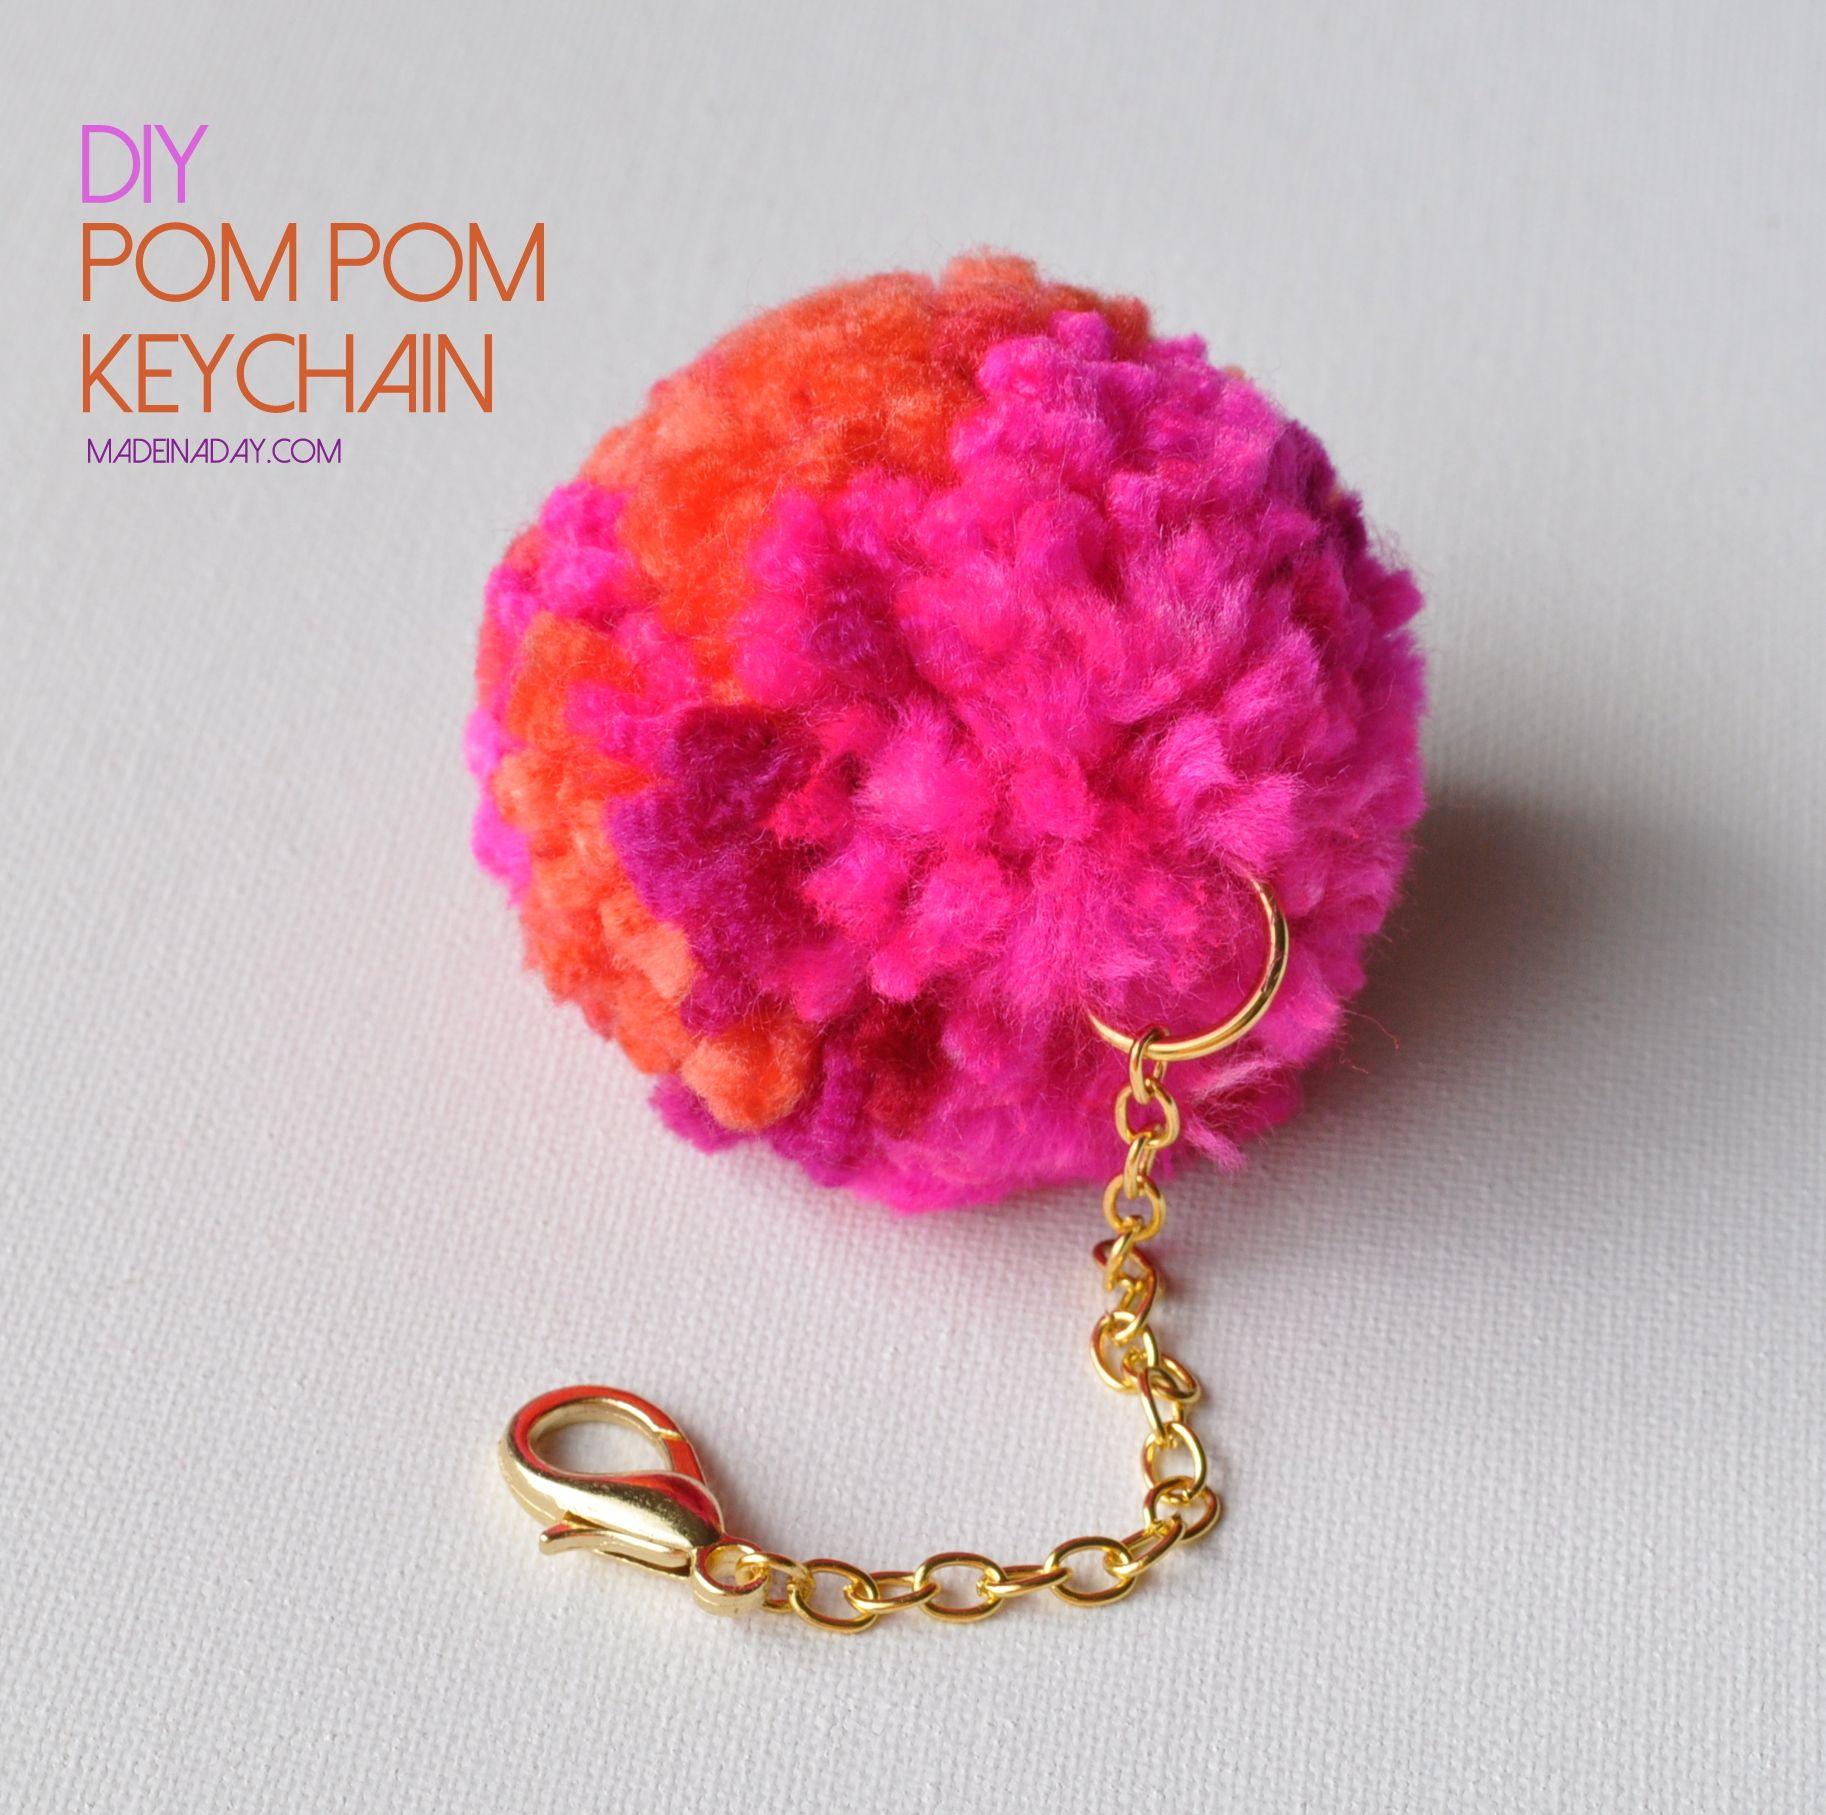 Diy pom pom keychain clover pom pom maker pom pom maker for Homemade crafts for sale online